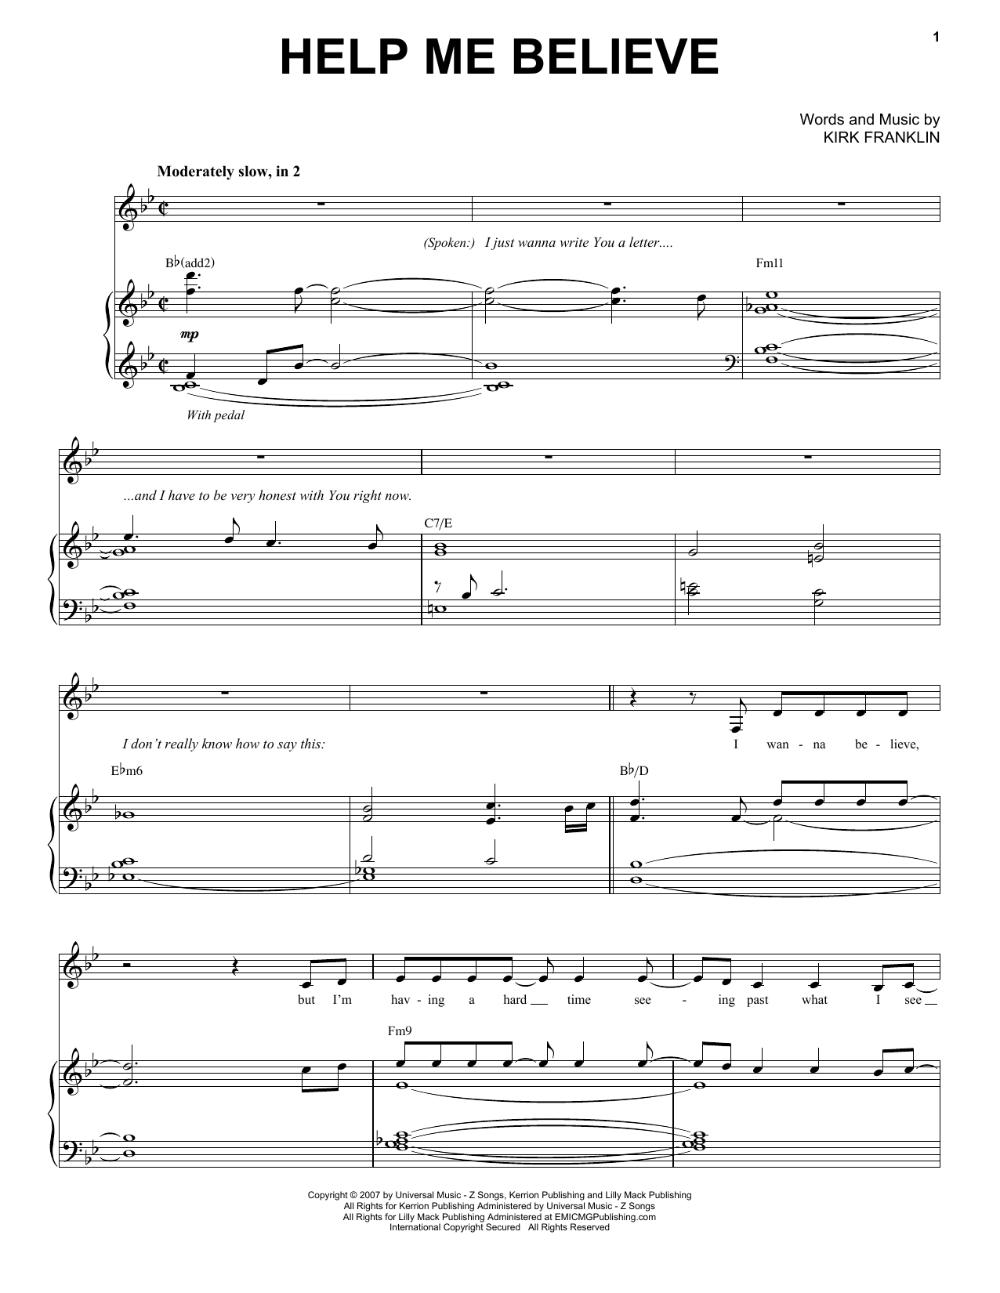 Kirk Franklin Help Me Believe 67331 in 2020 Sheet music